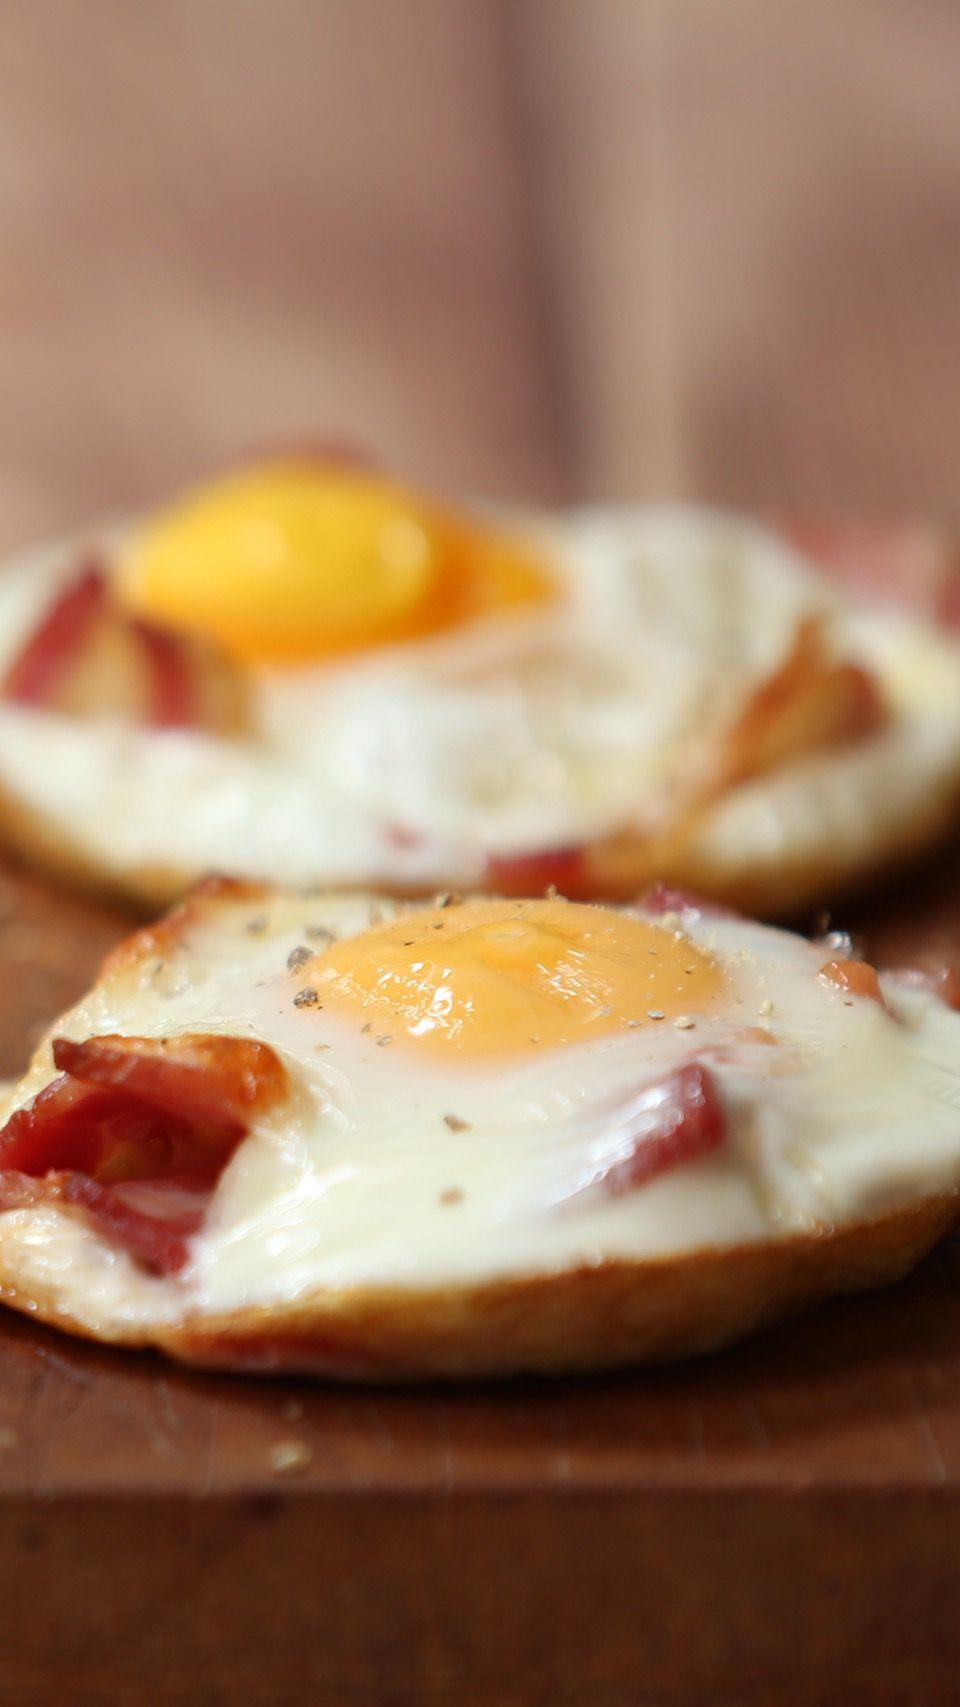 Gooey, cheesy goodness. Breakfast has never been better.